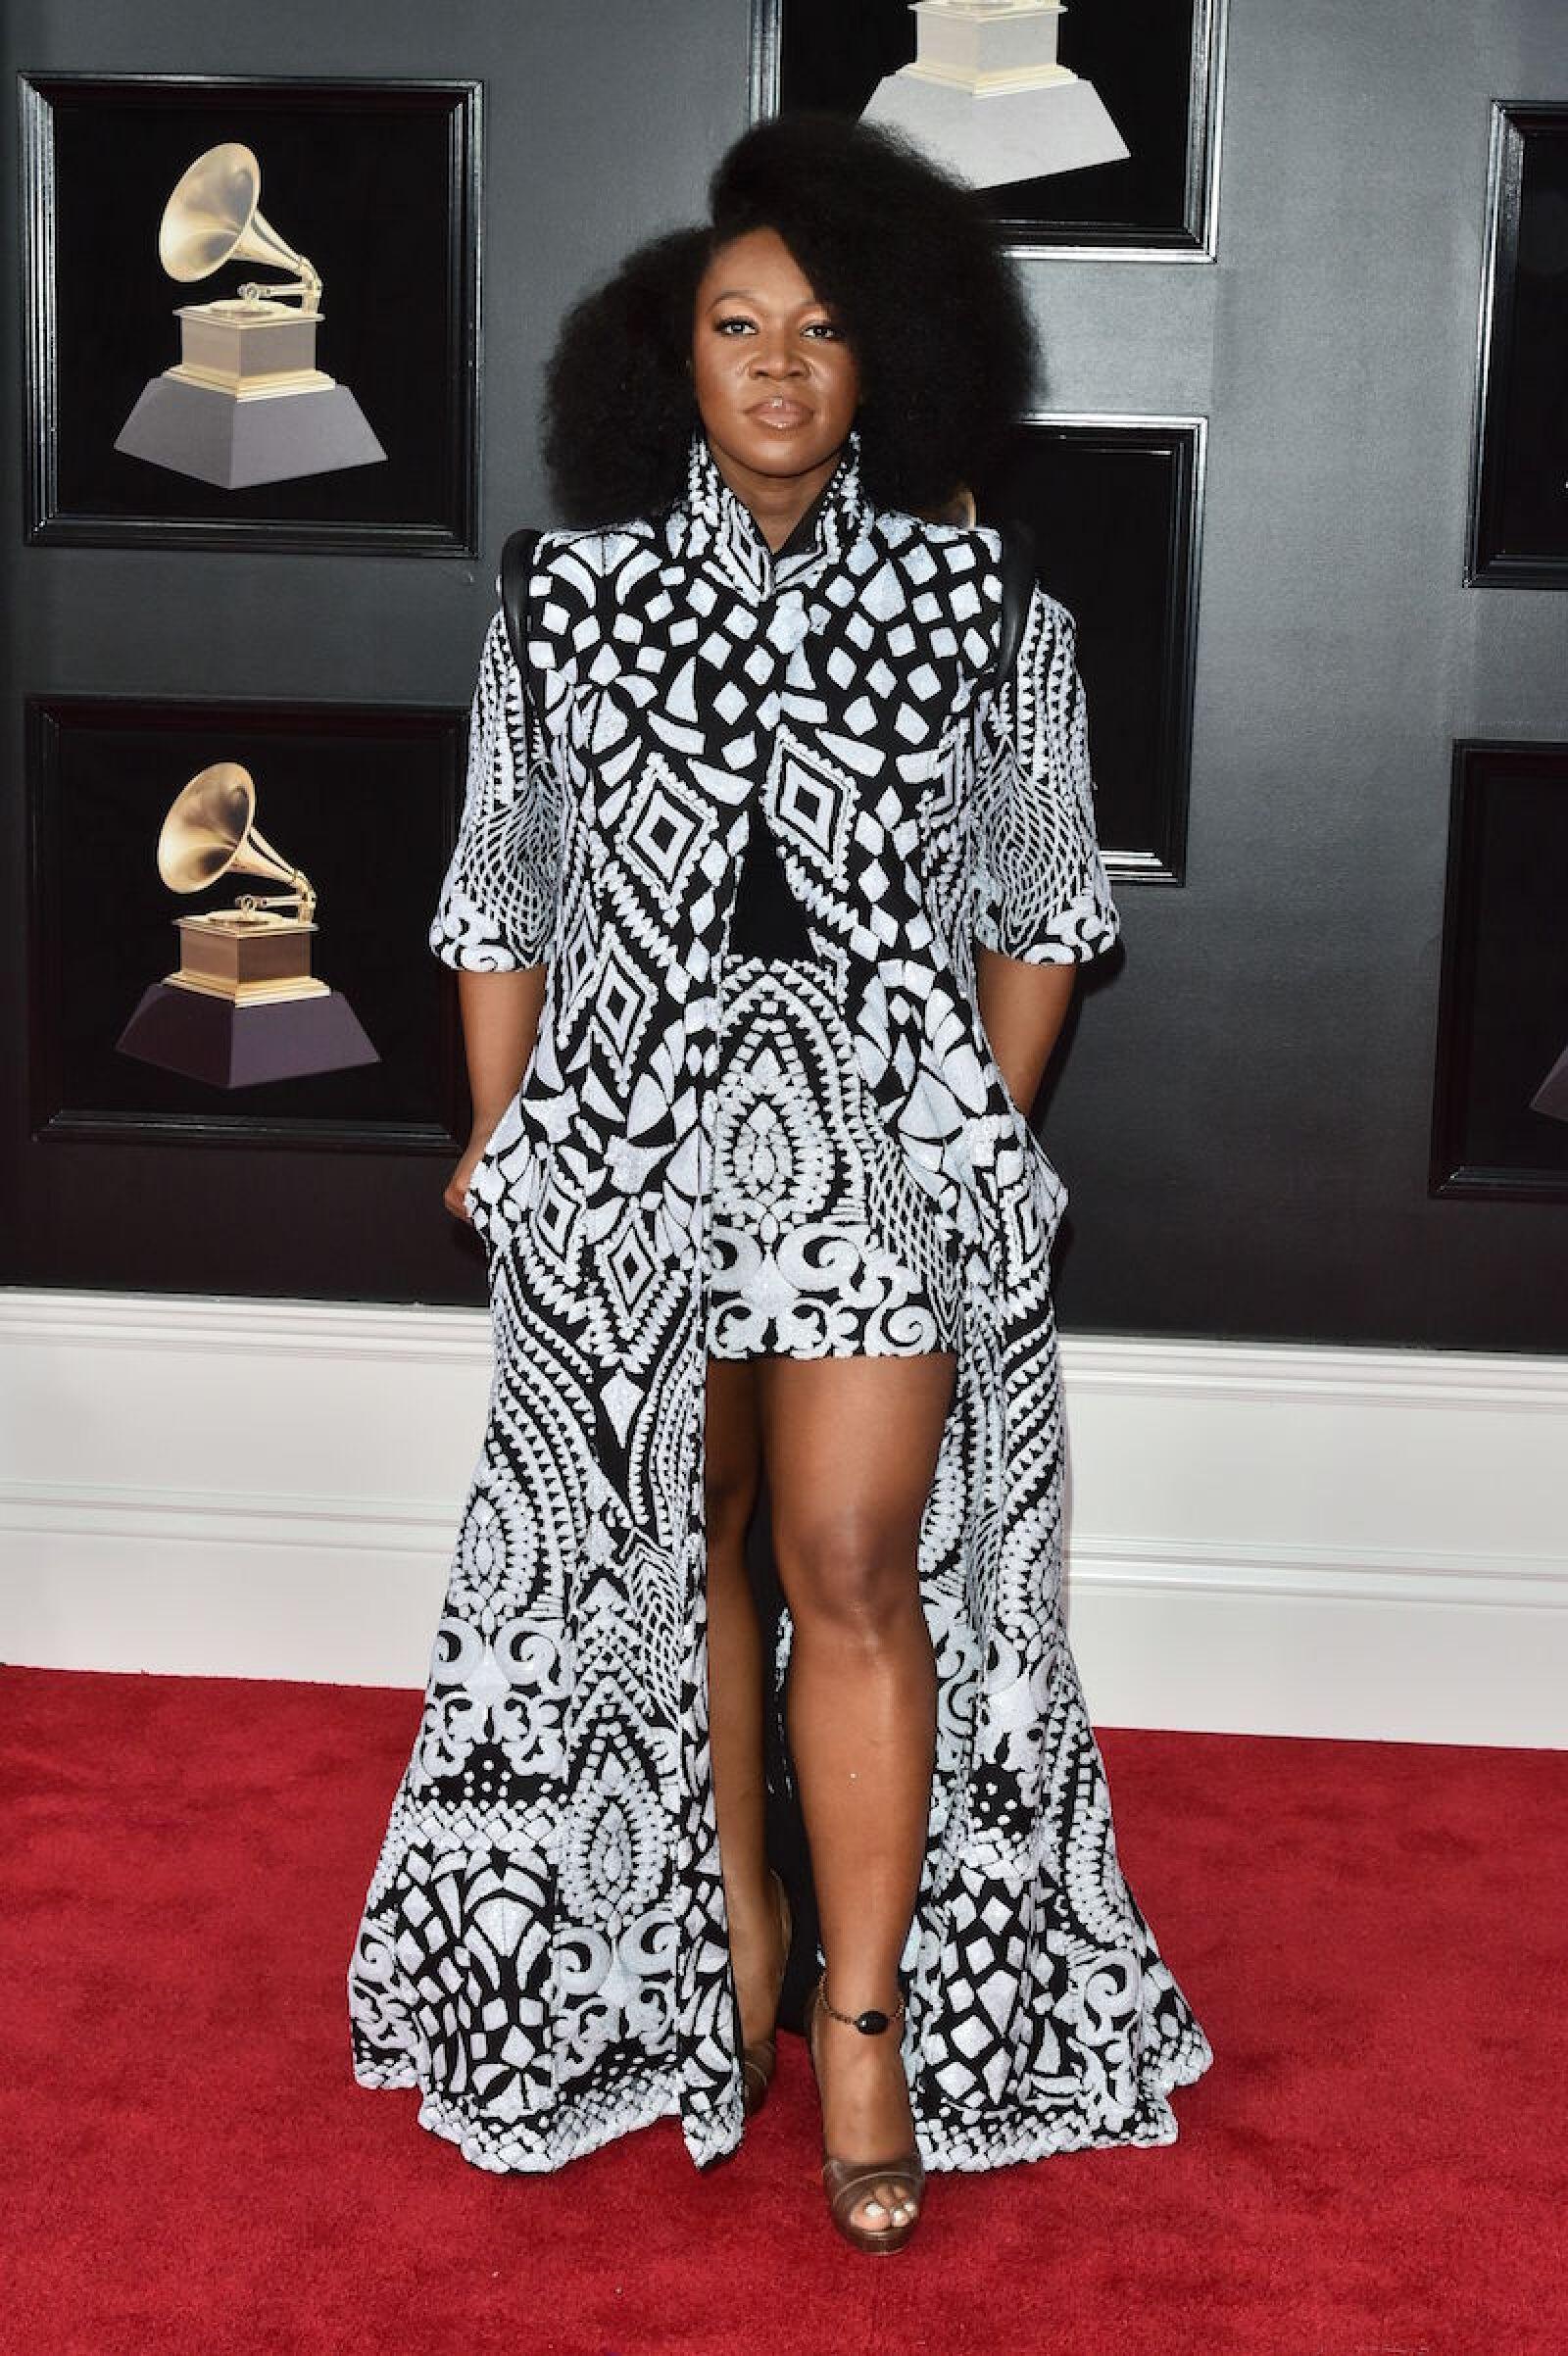 60th Annual Grammy Awards, Arrivals, New York, USA - 28 Jan 2018